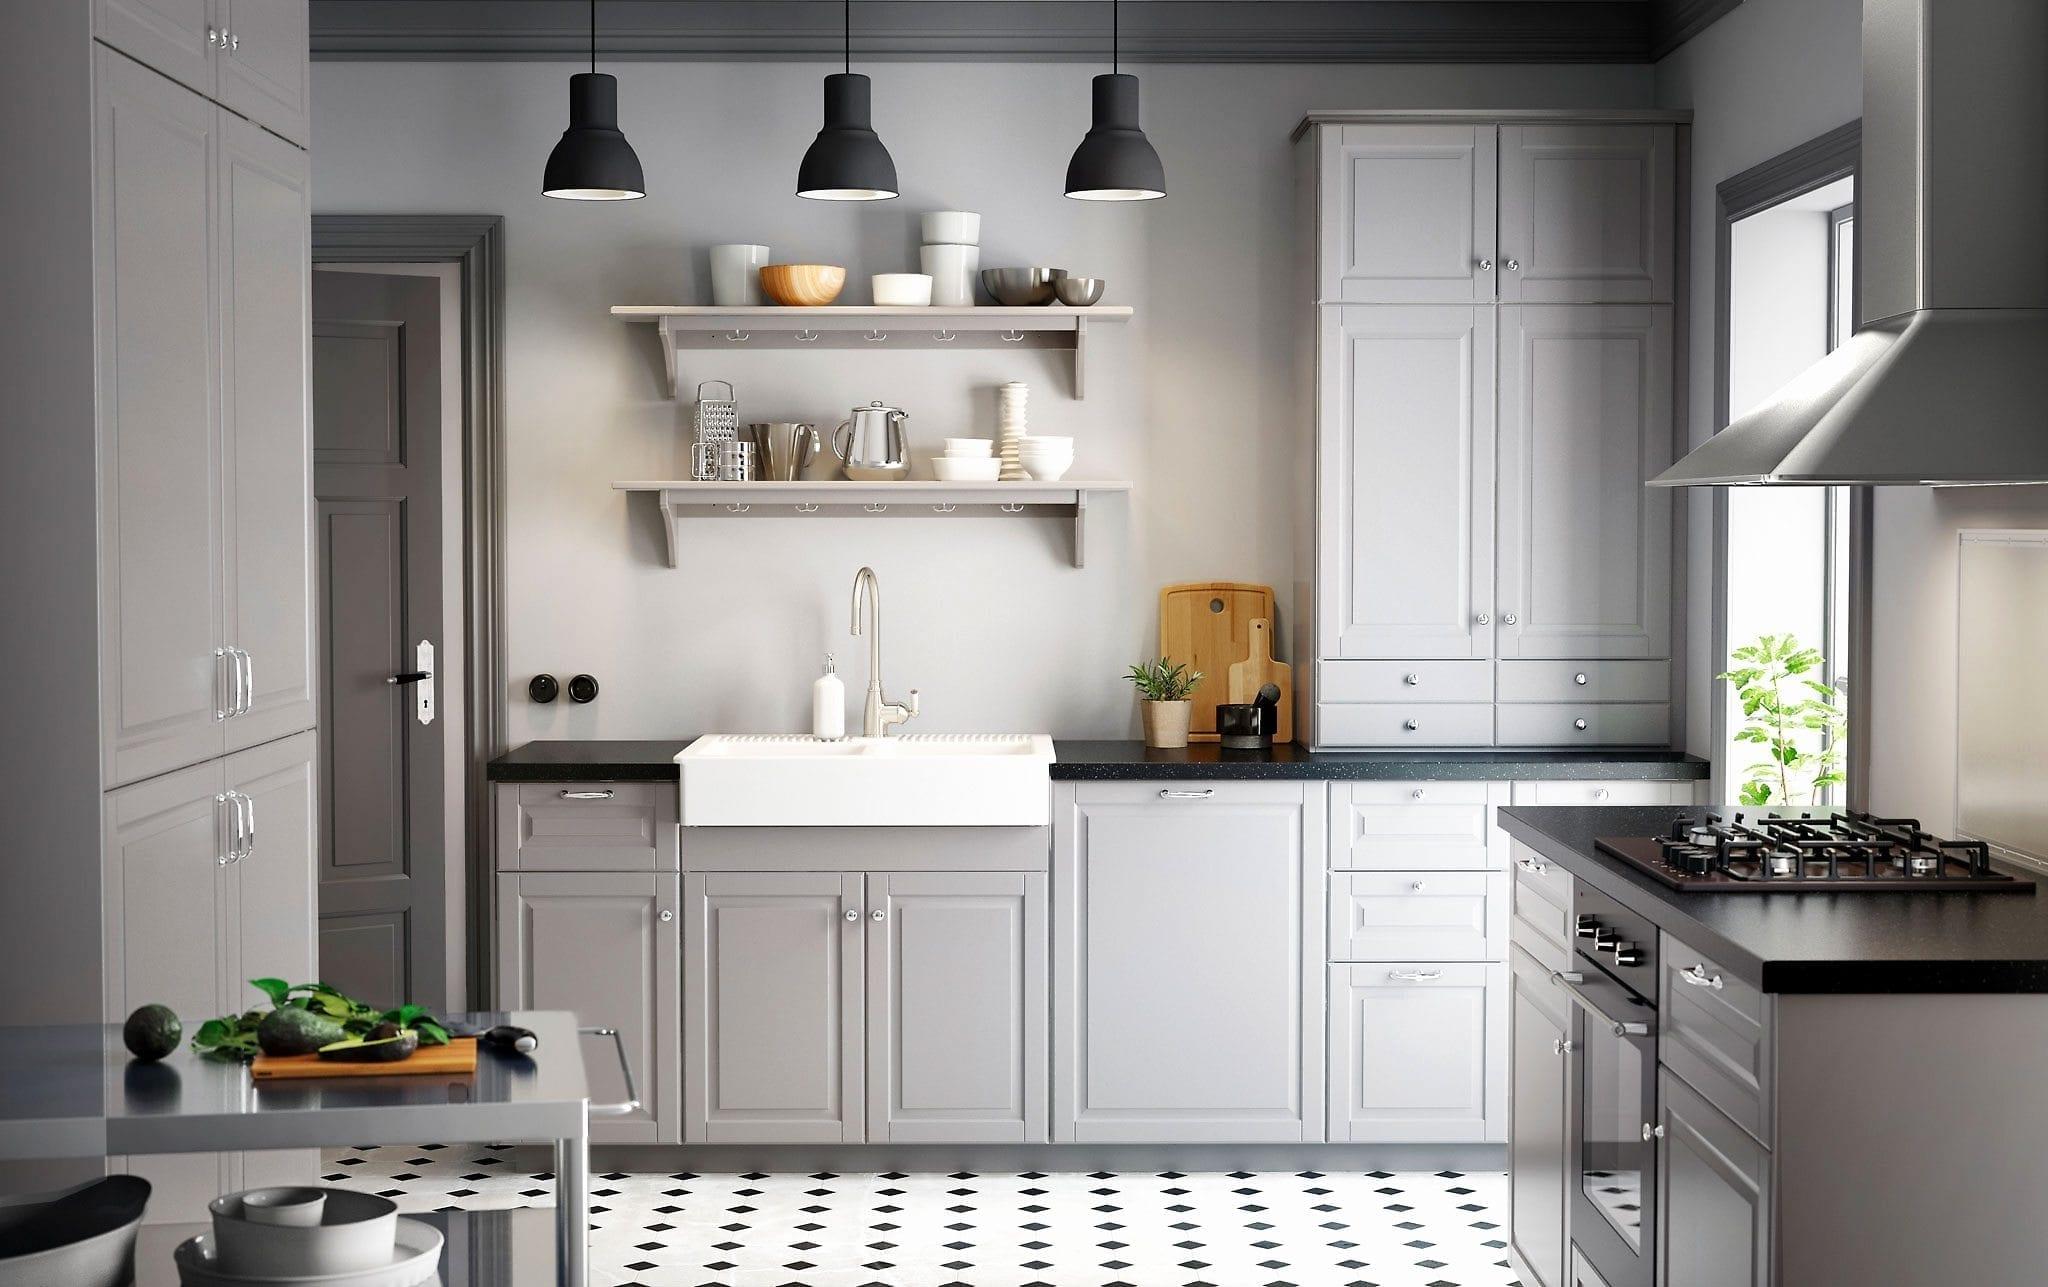 Home renovation reality check